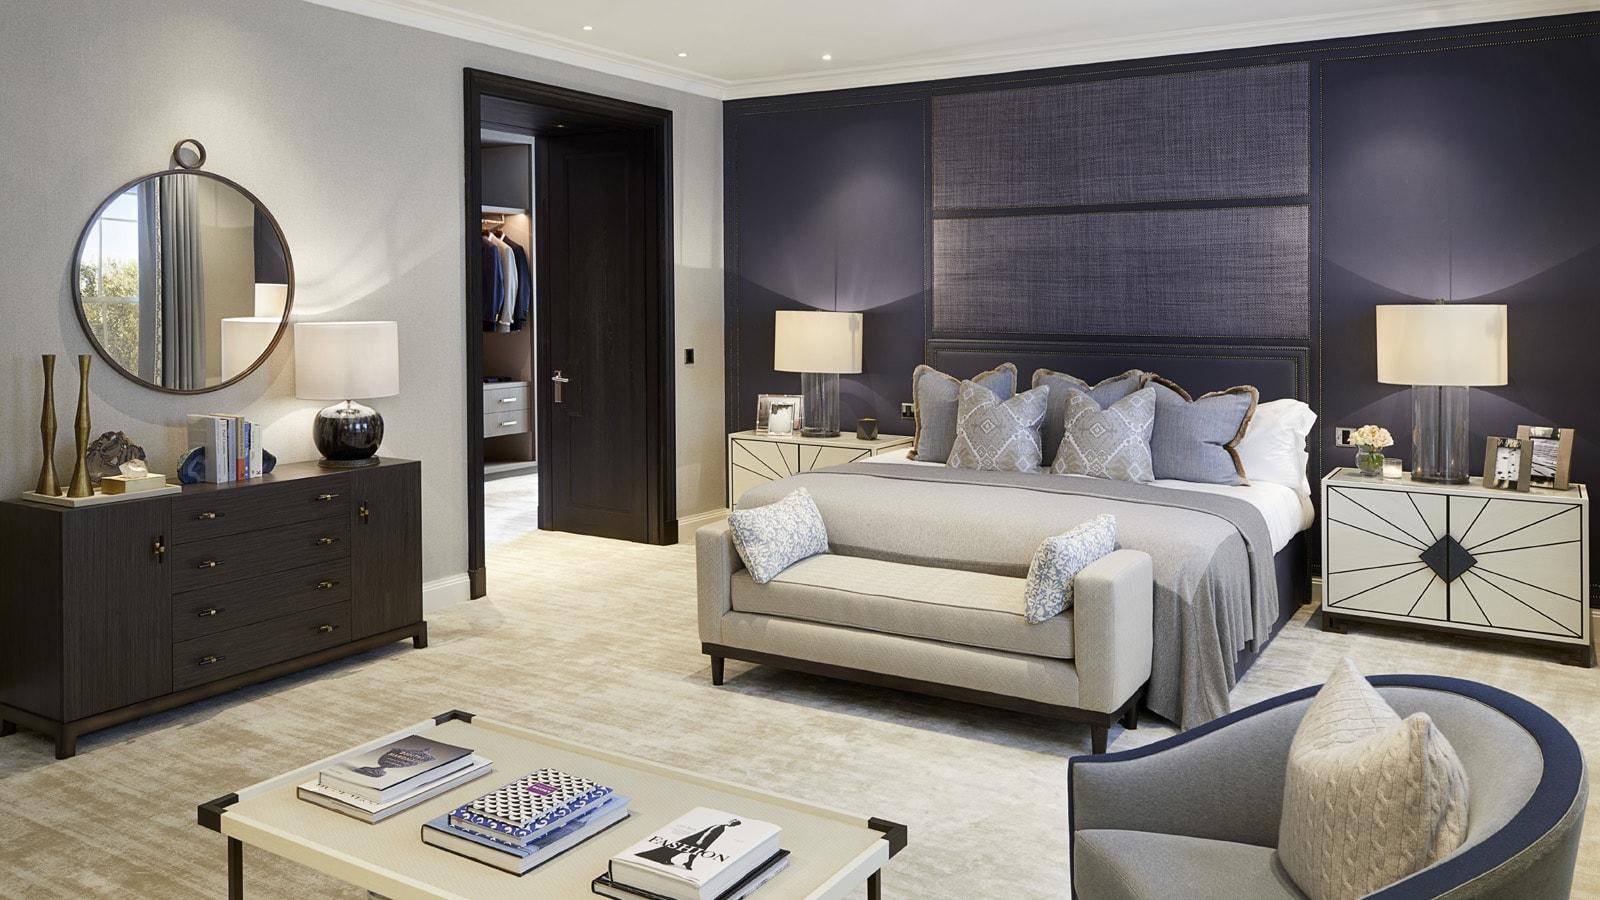 Four Seasons bringt Private Residences nach London 6